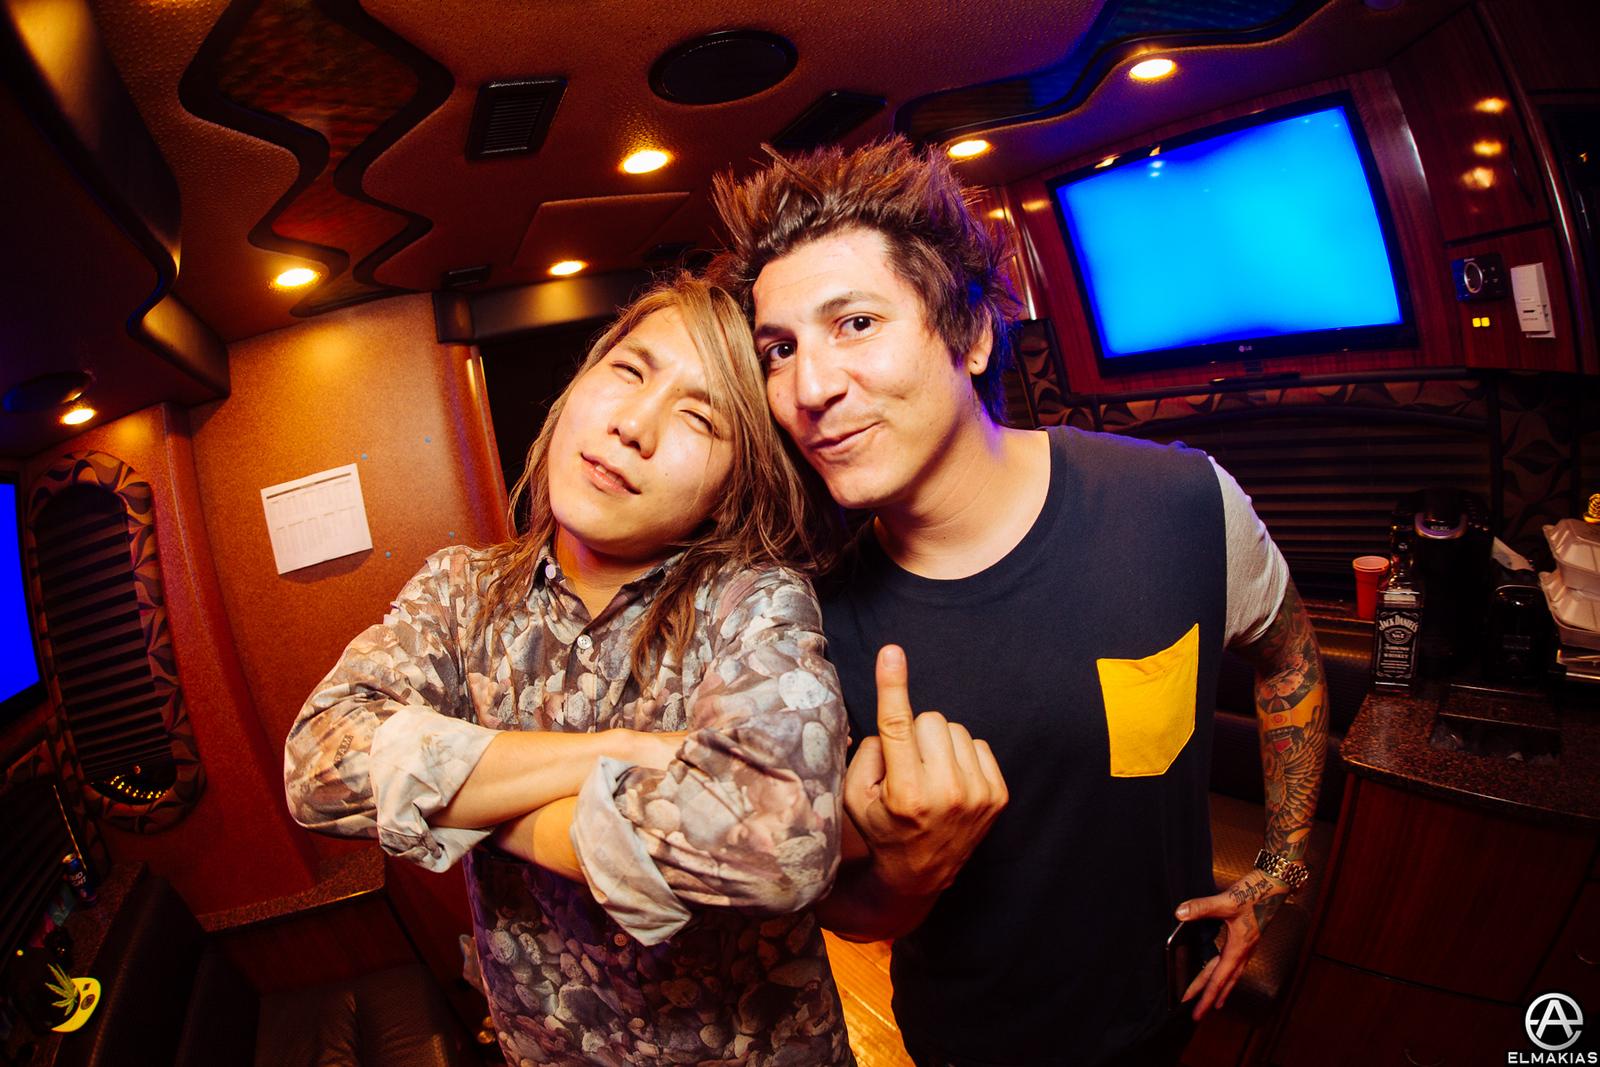 Hiroki Ikegawa of Crossfaith and Jaime Preciado of Pierce The Veil at Vans Warped Tour 2015 by Adam Elmakias